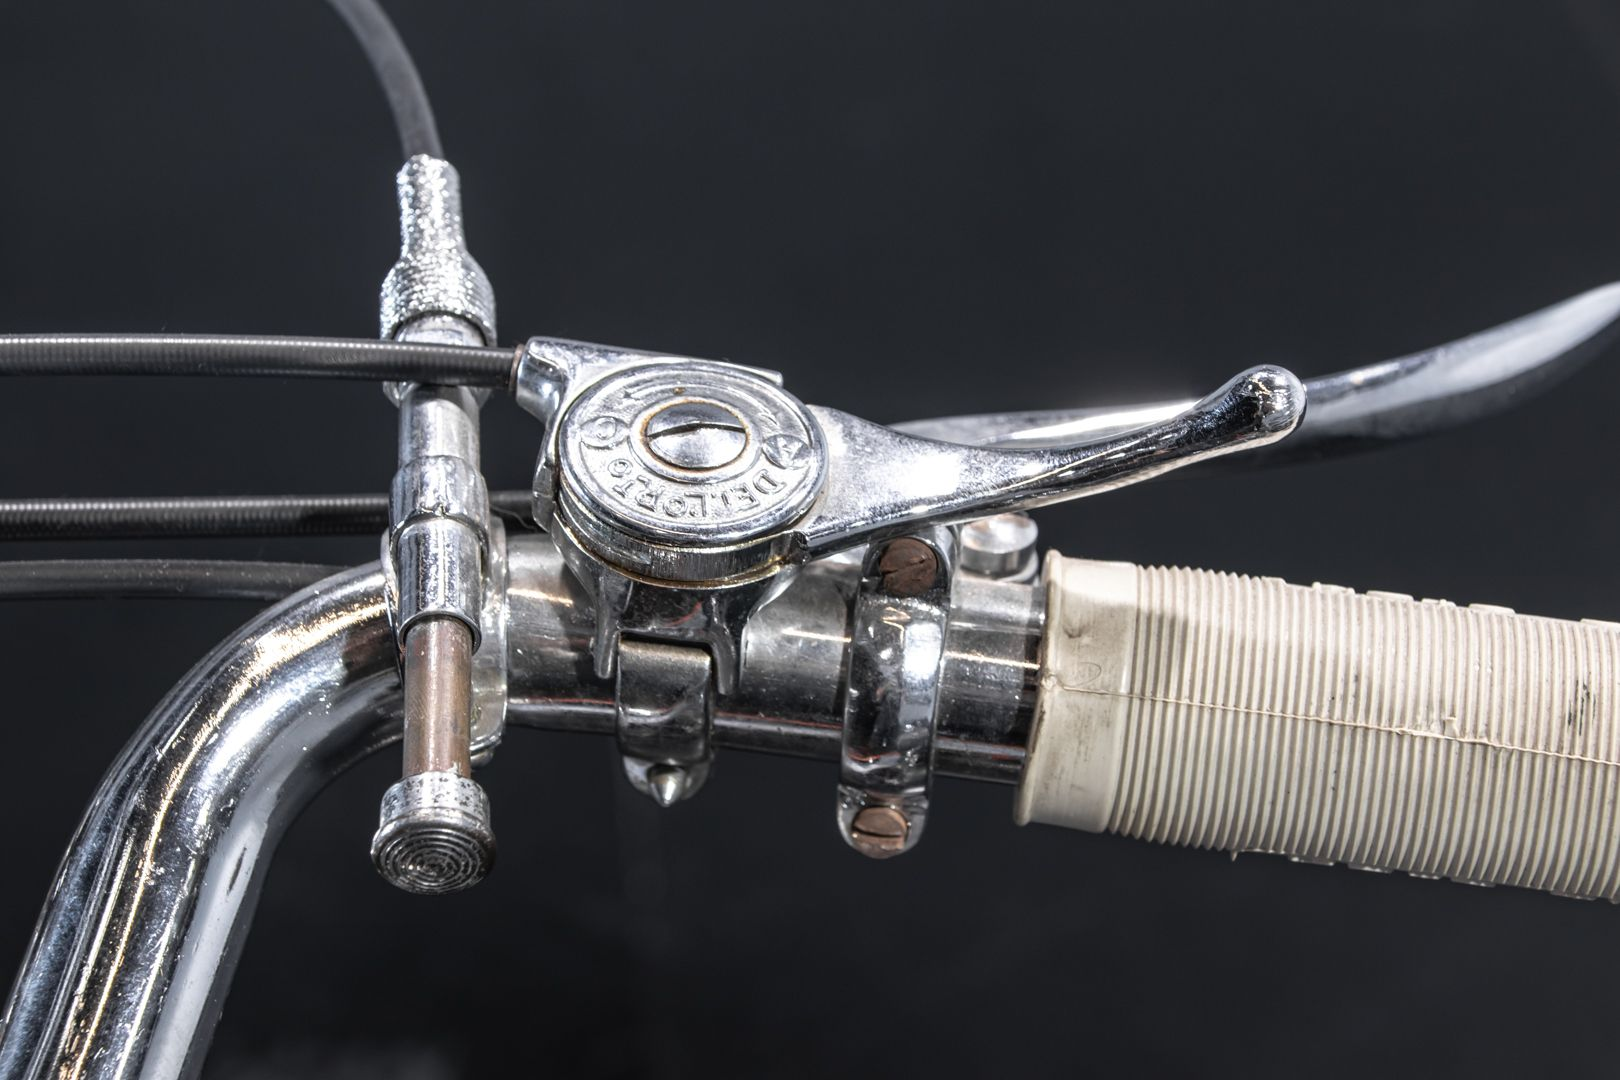 1951 Moto Guzzi 500 72191